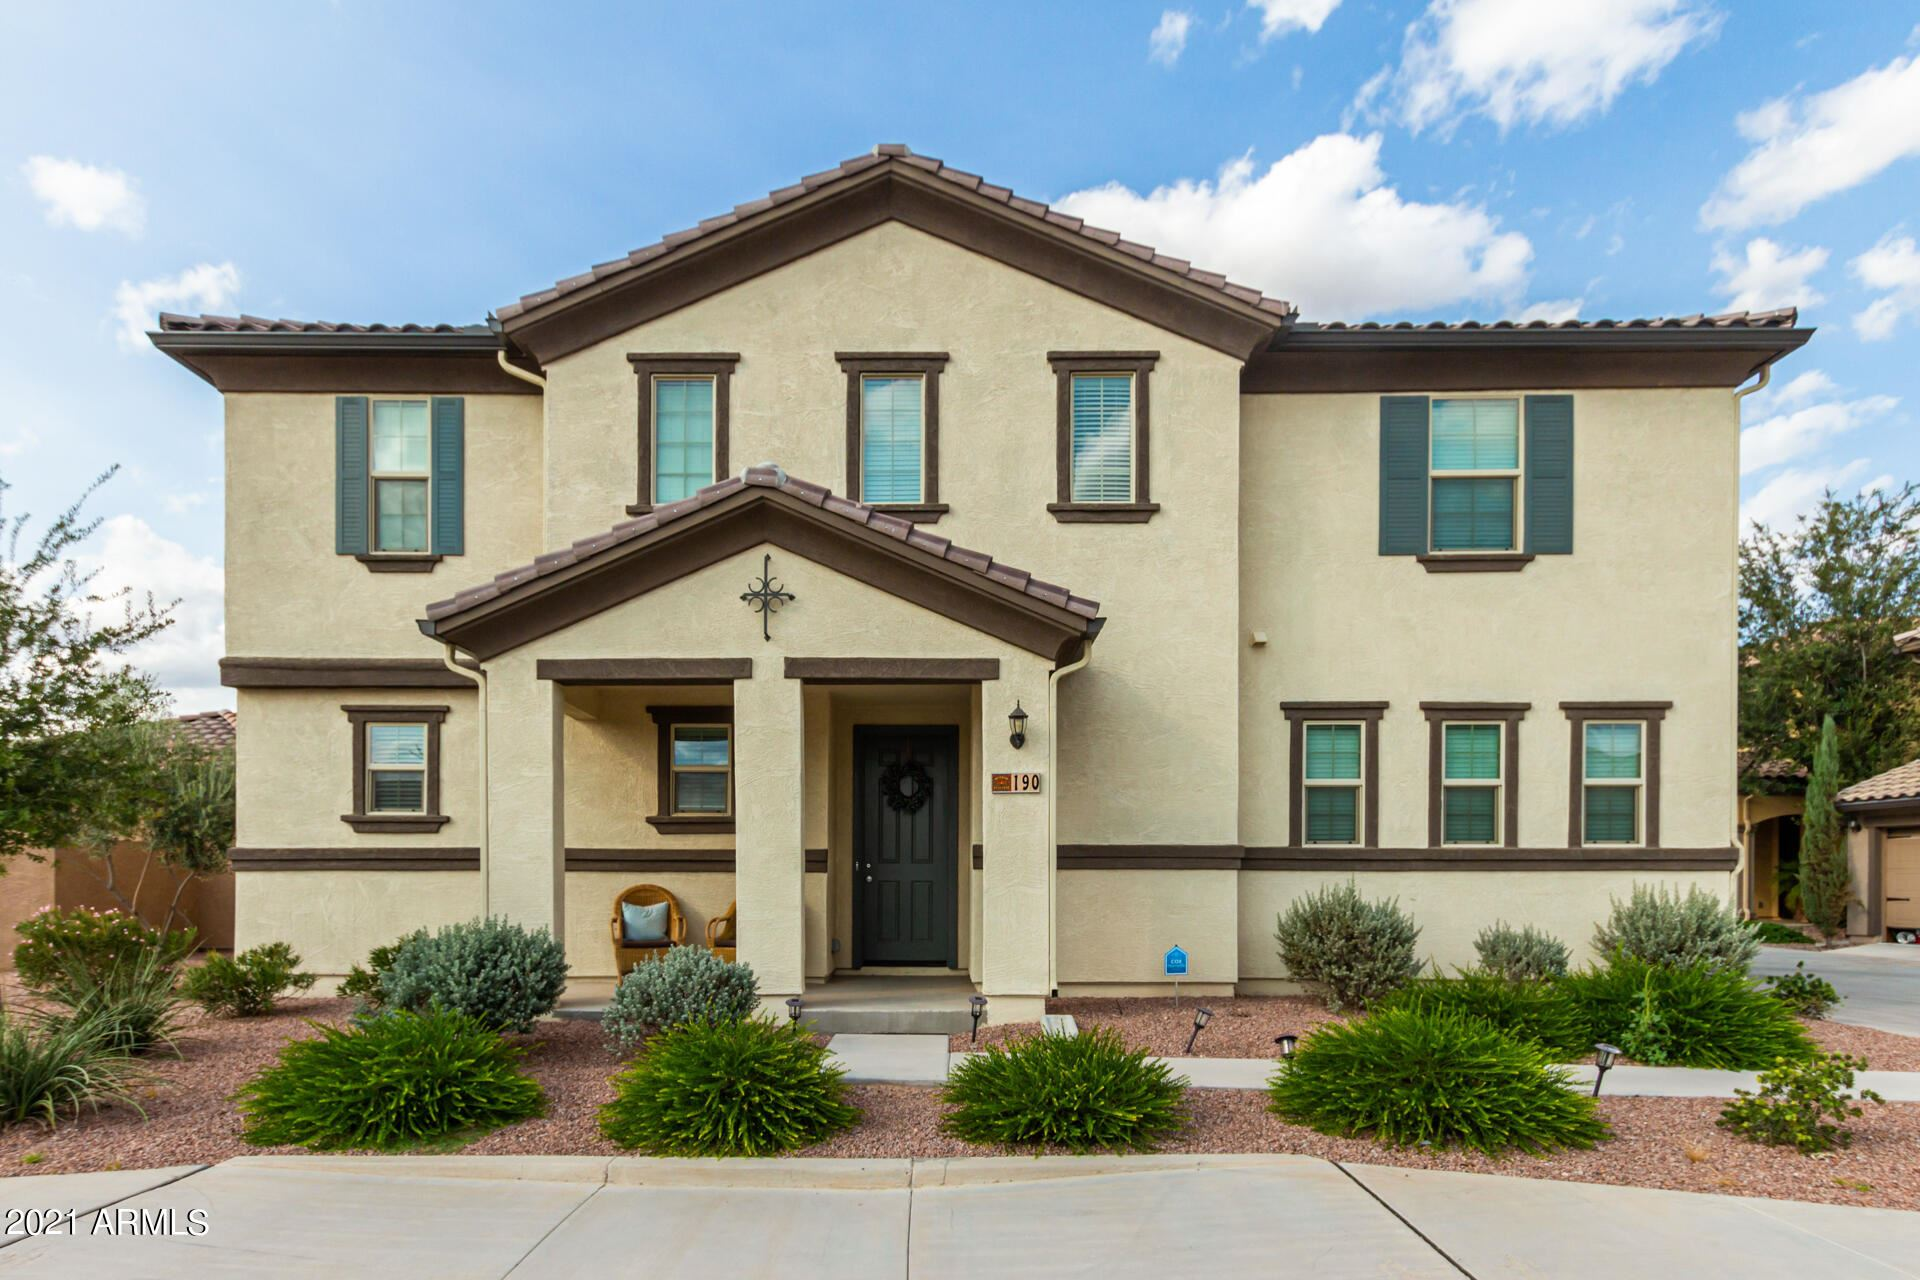 Photo of 190 E BLUEJAY Drive, Chandler, AZ 85286 (MLS # 6306174)